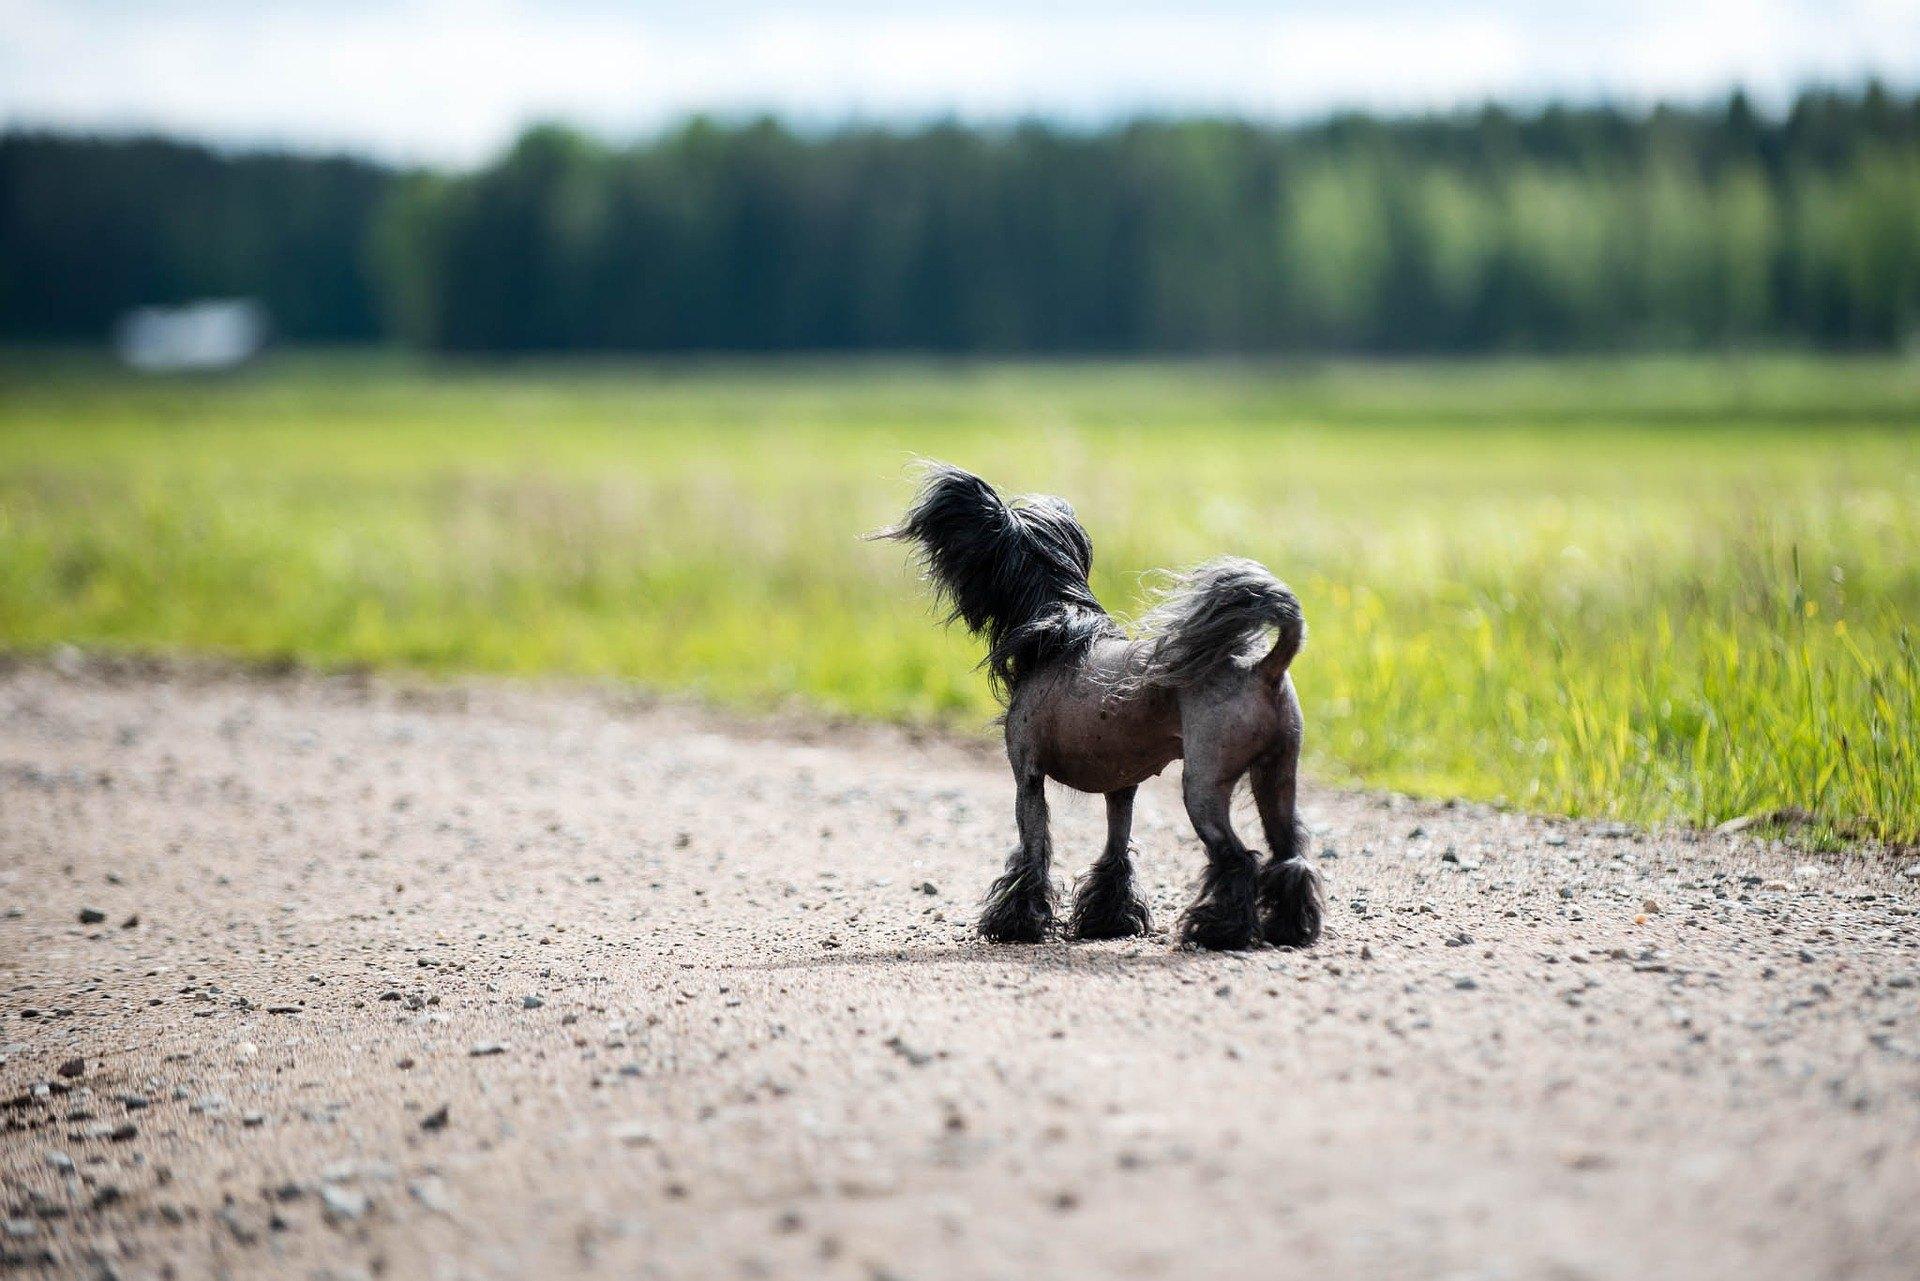 Čínský chocholatý pes je pes neobvyklého vzhledu. Je živý, veselý, aktivní a zároveň poslušný chovateli.